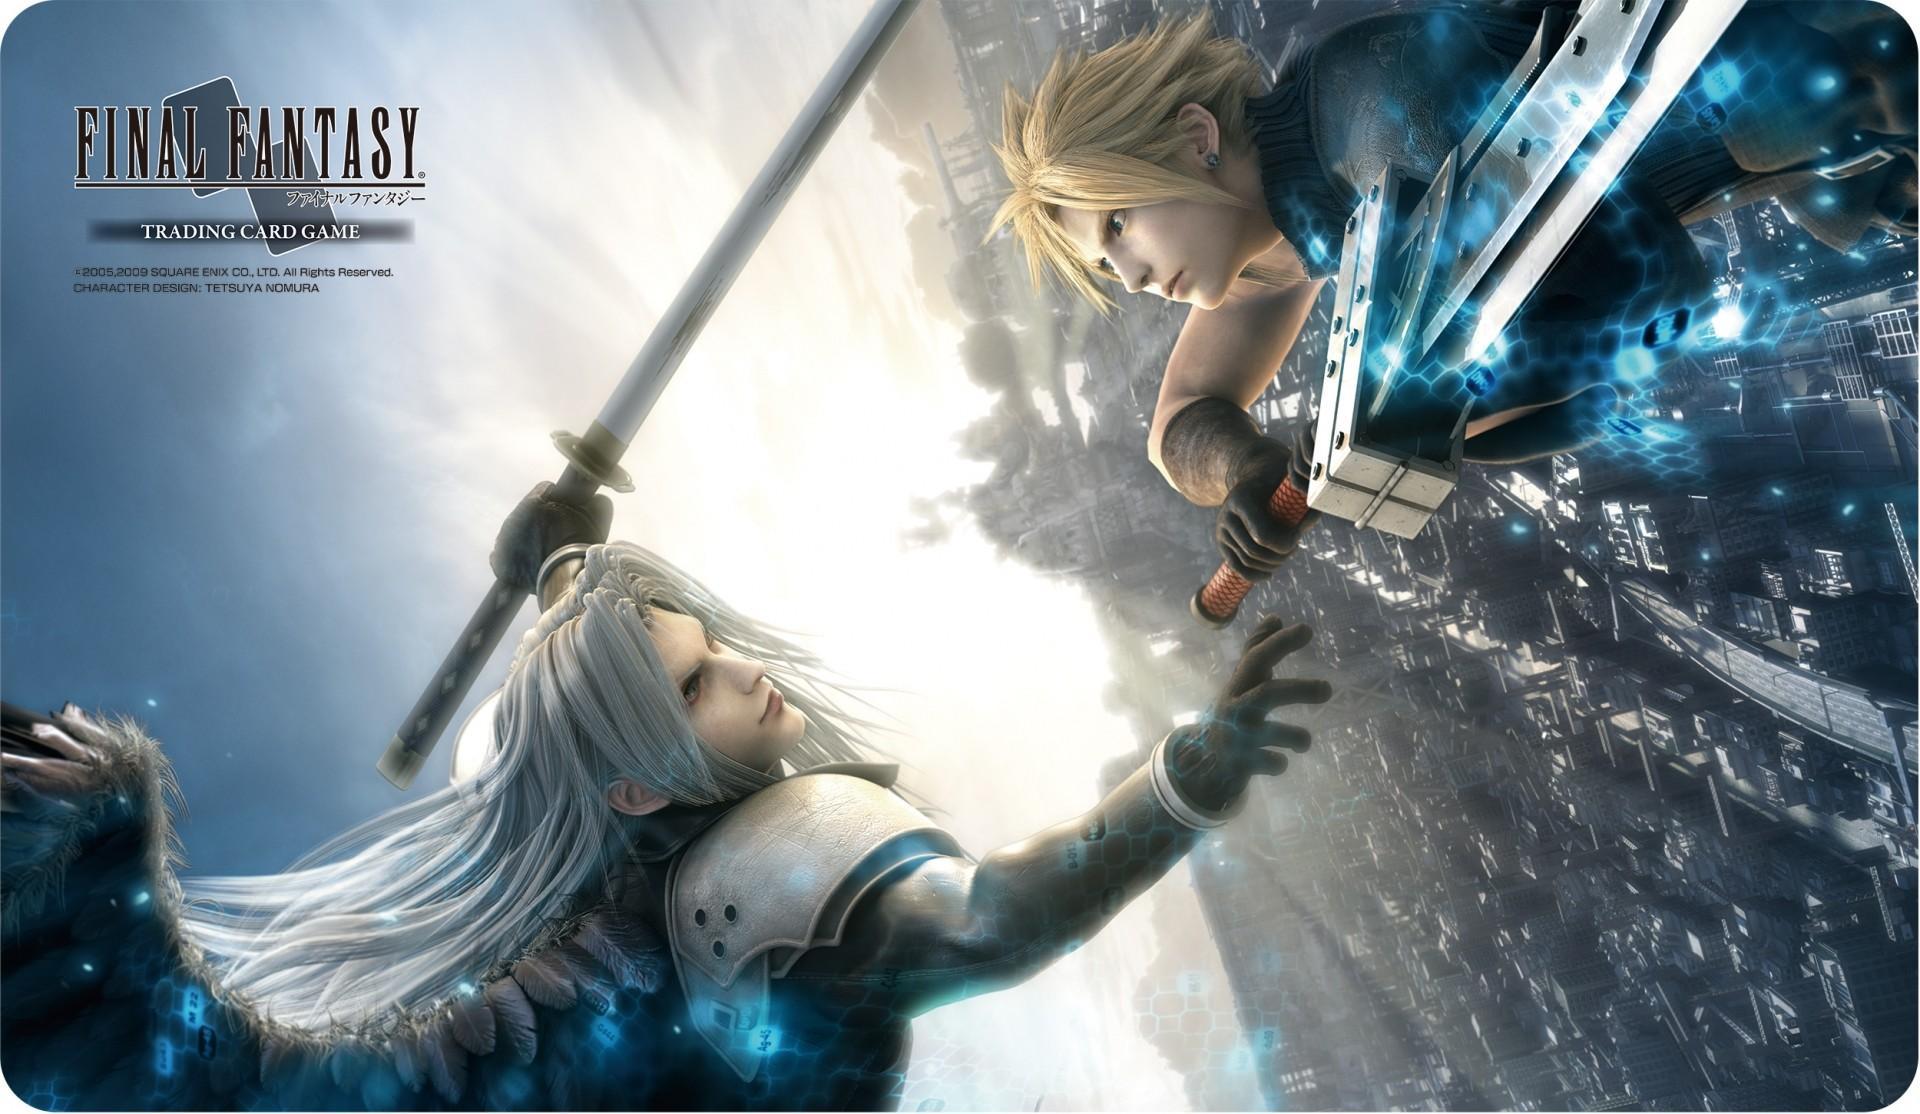 Final Fantasy Vii Remake Sephiroth Wallpapers Wallpaper Cave